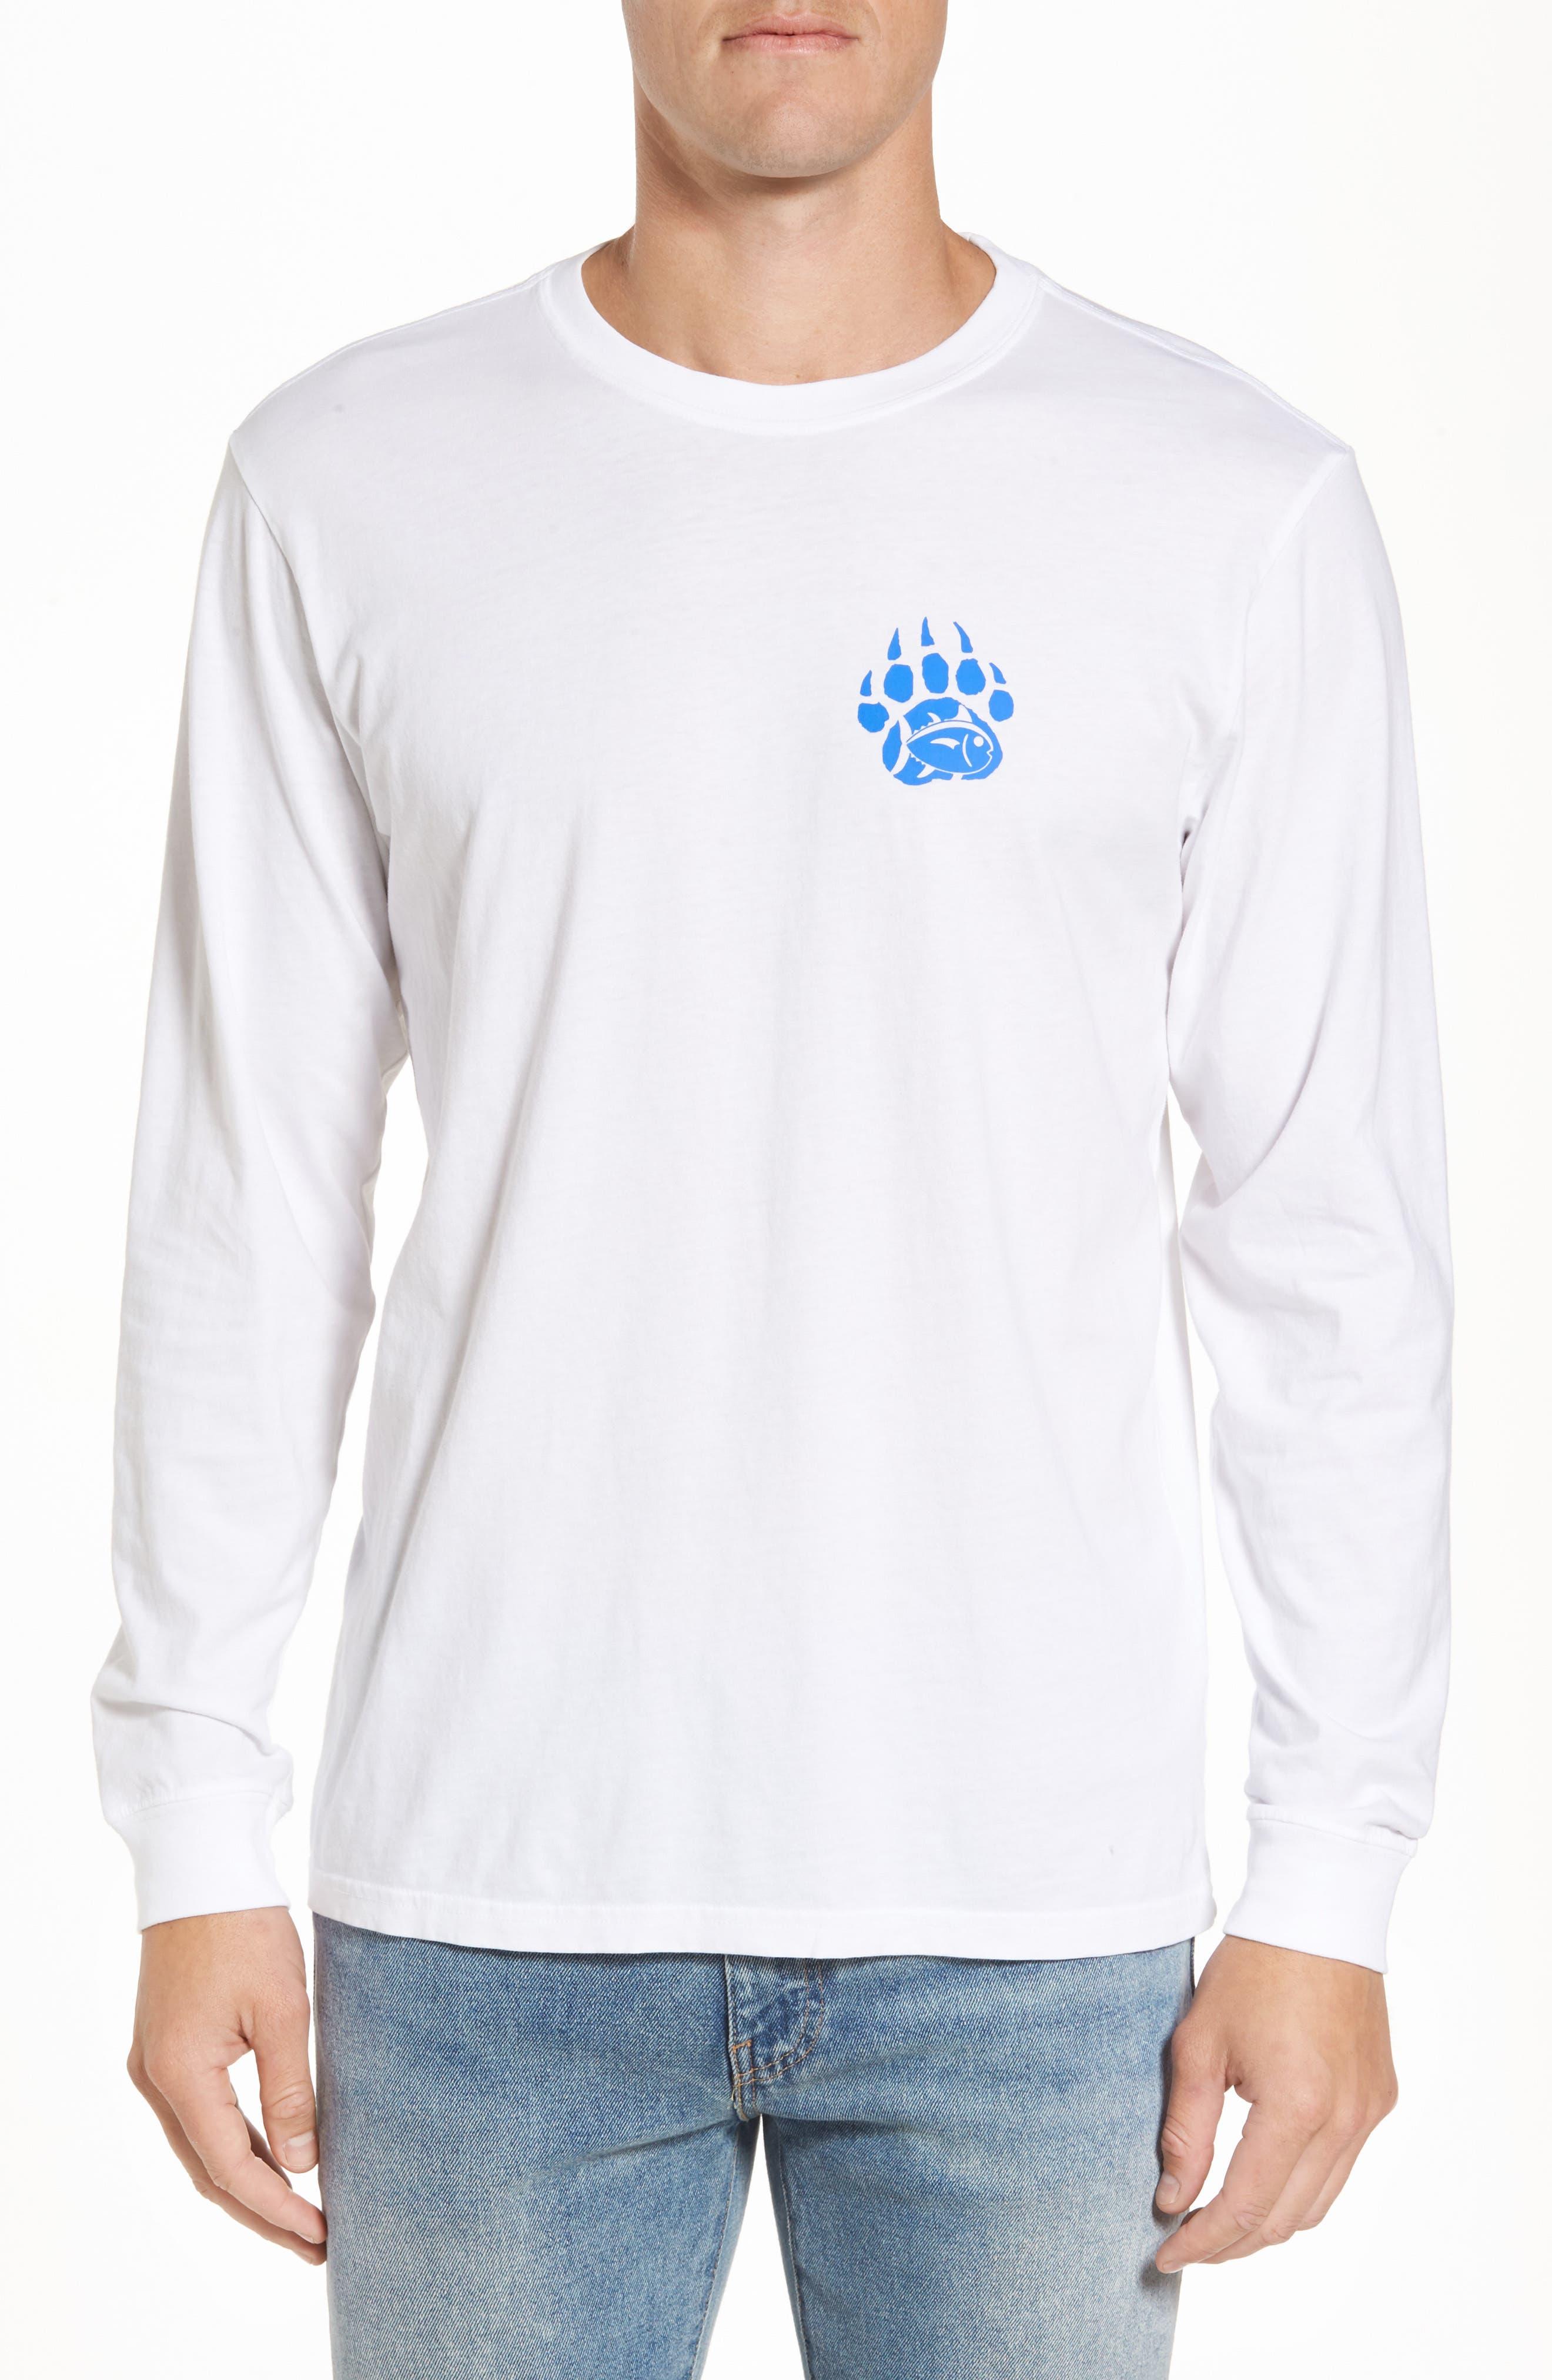 Main Image - Southern Tide Blue Ridge Bear T-Shirt